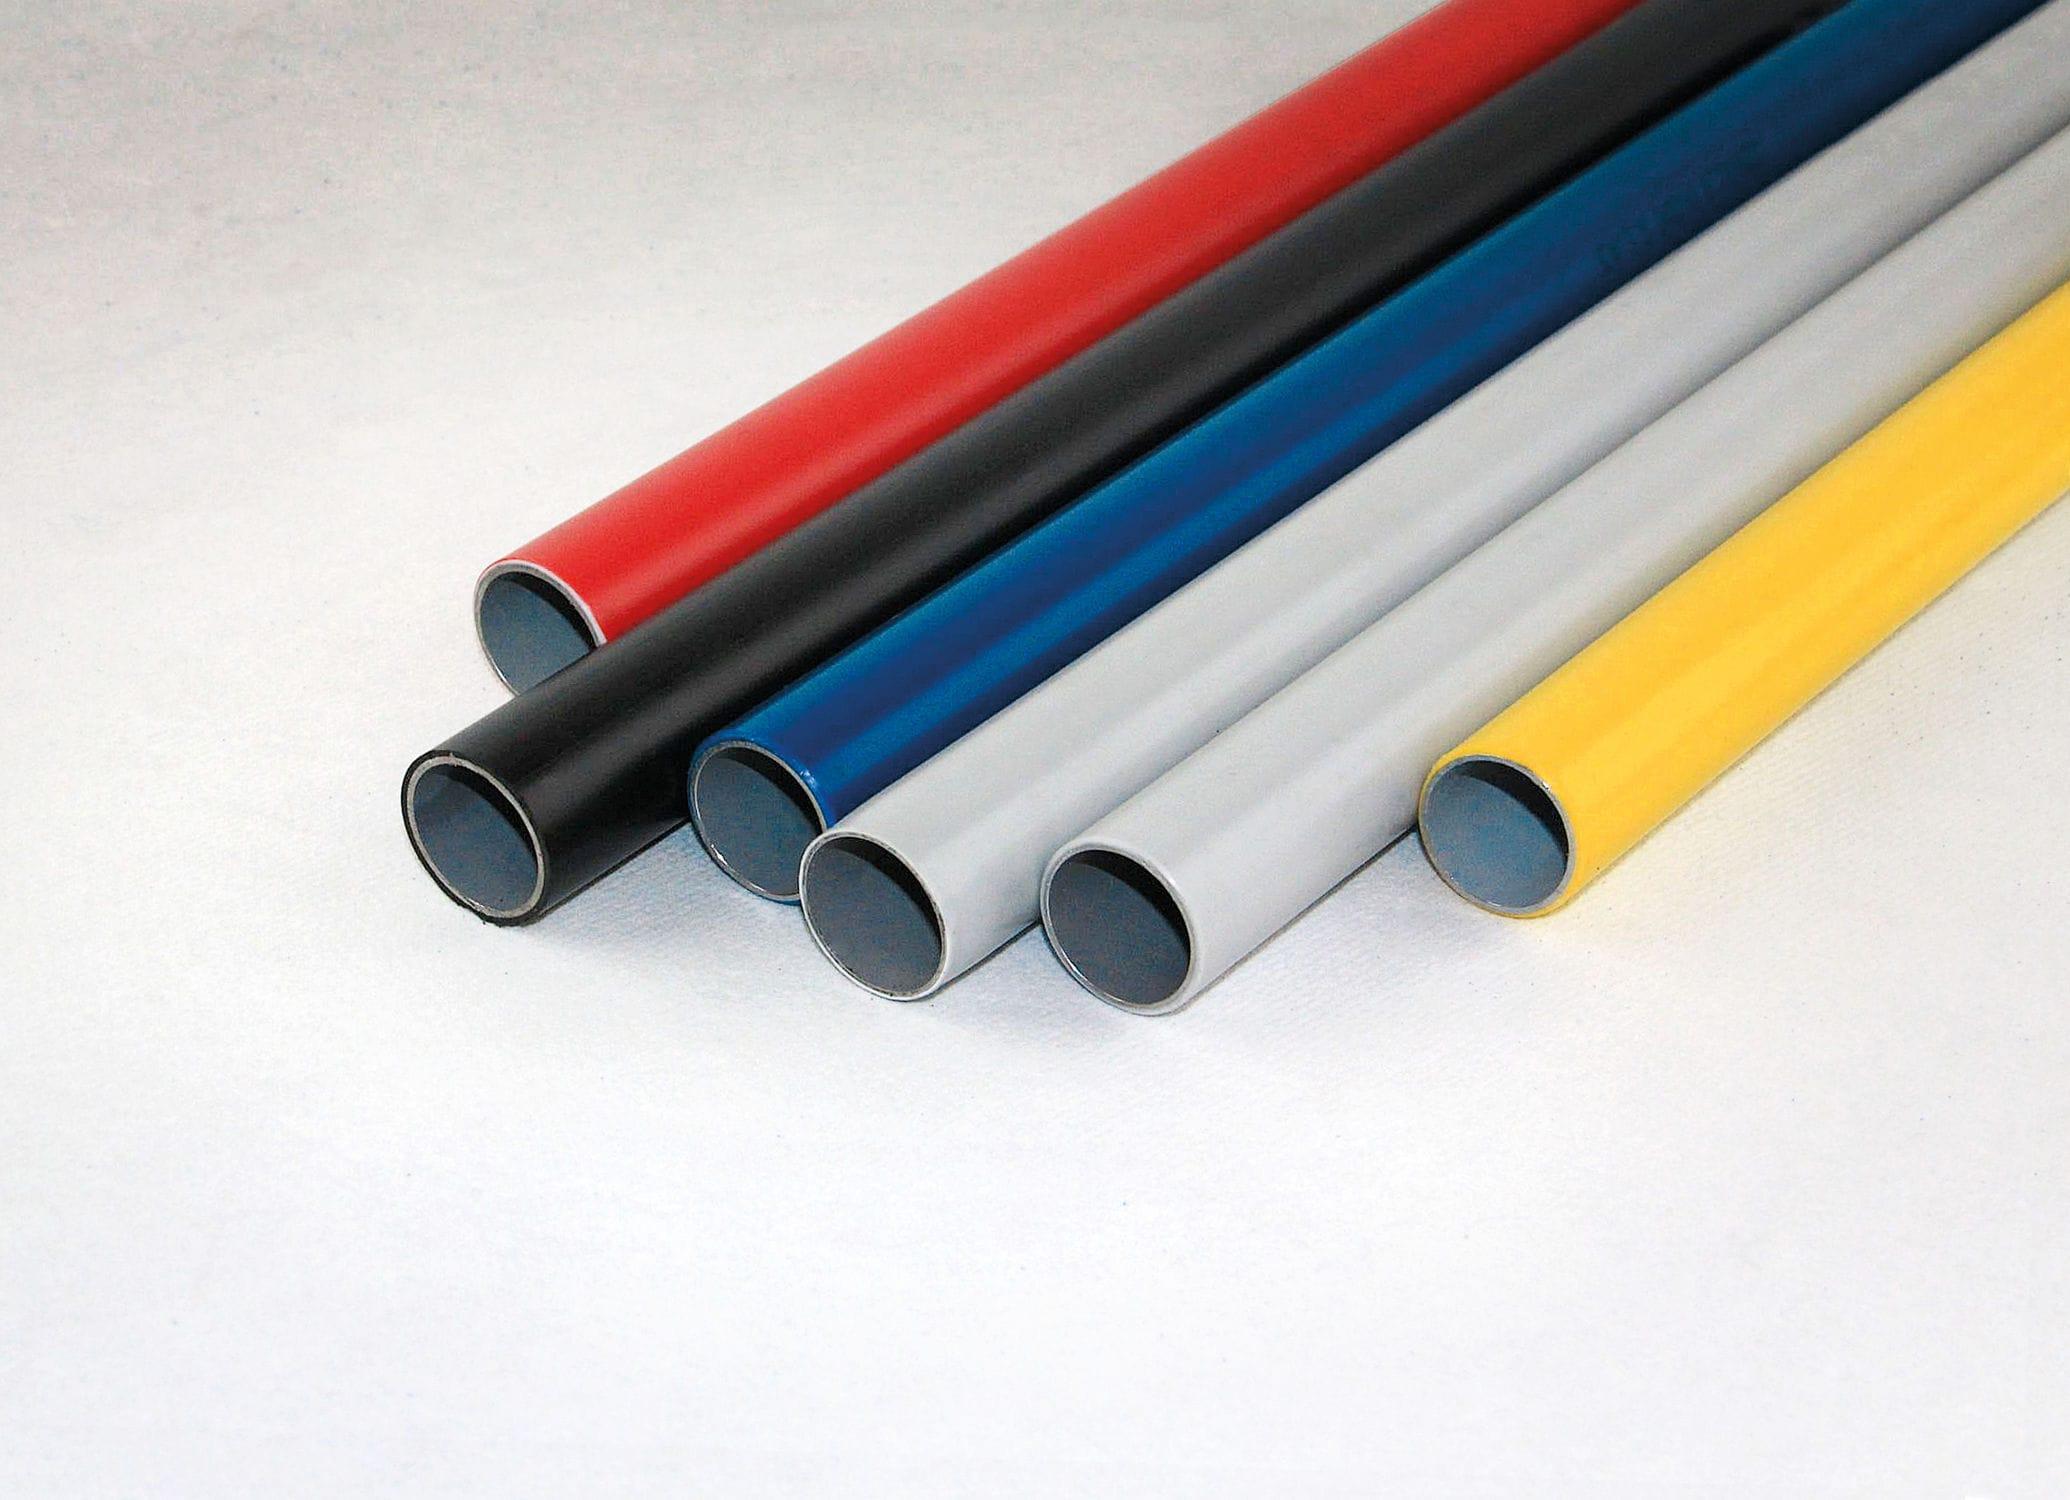 water pipe / steel / chemical-resistant / oil-resistant - D-COAT & Water pipe / steel / chemical-resistant / oil-resistant - D-COAT ...